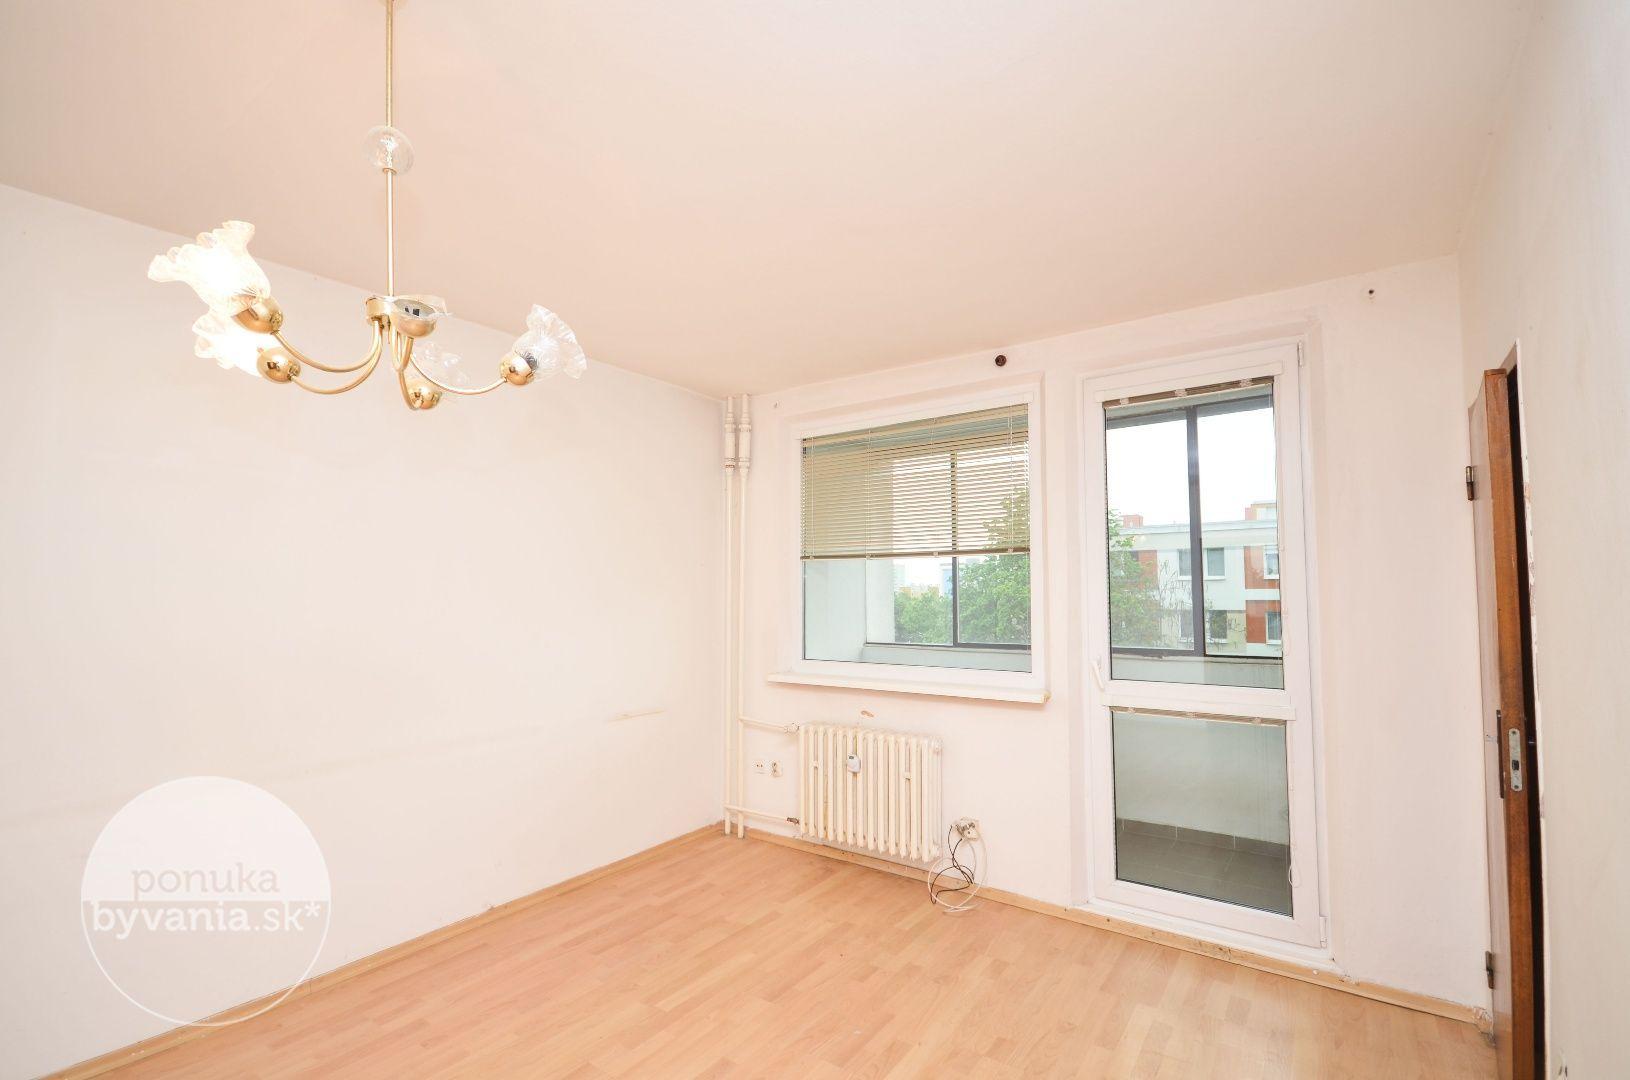 ponukabyvania.sk_Slatinská_4-izbový-byt_KOHOUT